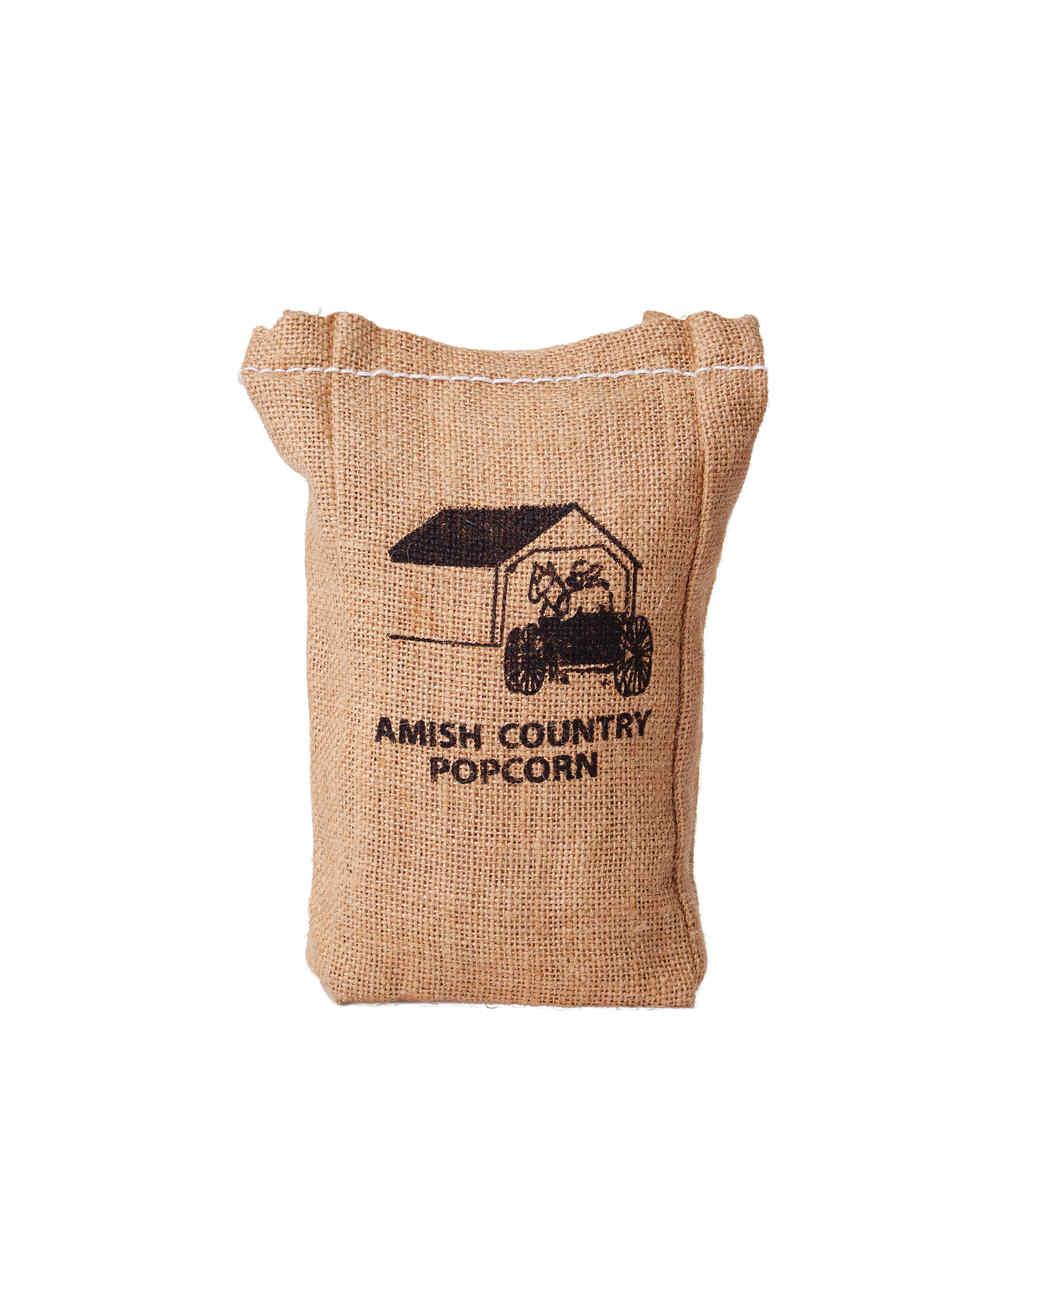 amish-country-popcorn-5230-d112774-l-0416.jpg